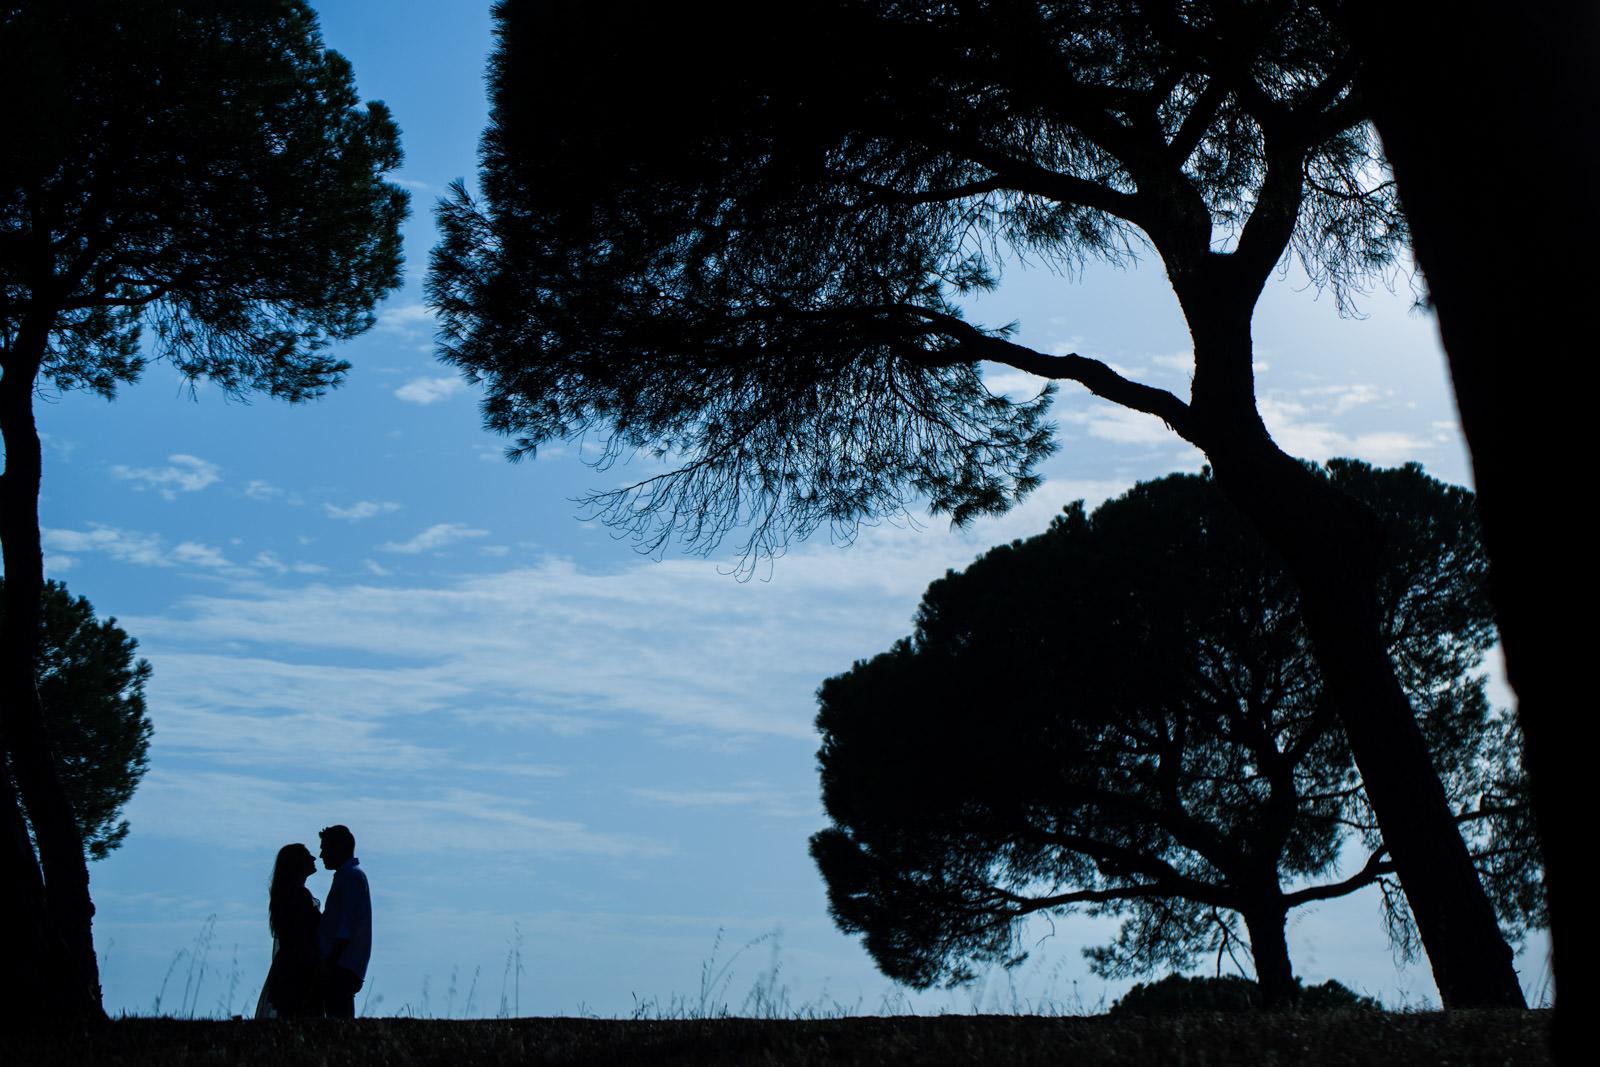 Wedroads-Boda-Sevilla-Parador-Carmona-bridal-engagement-Rafael-Torres-fotografo-bodas-sevilla-madrid-barcelona-wedding-photographer--3.jpg